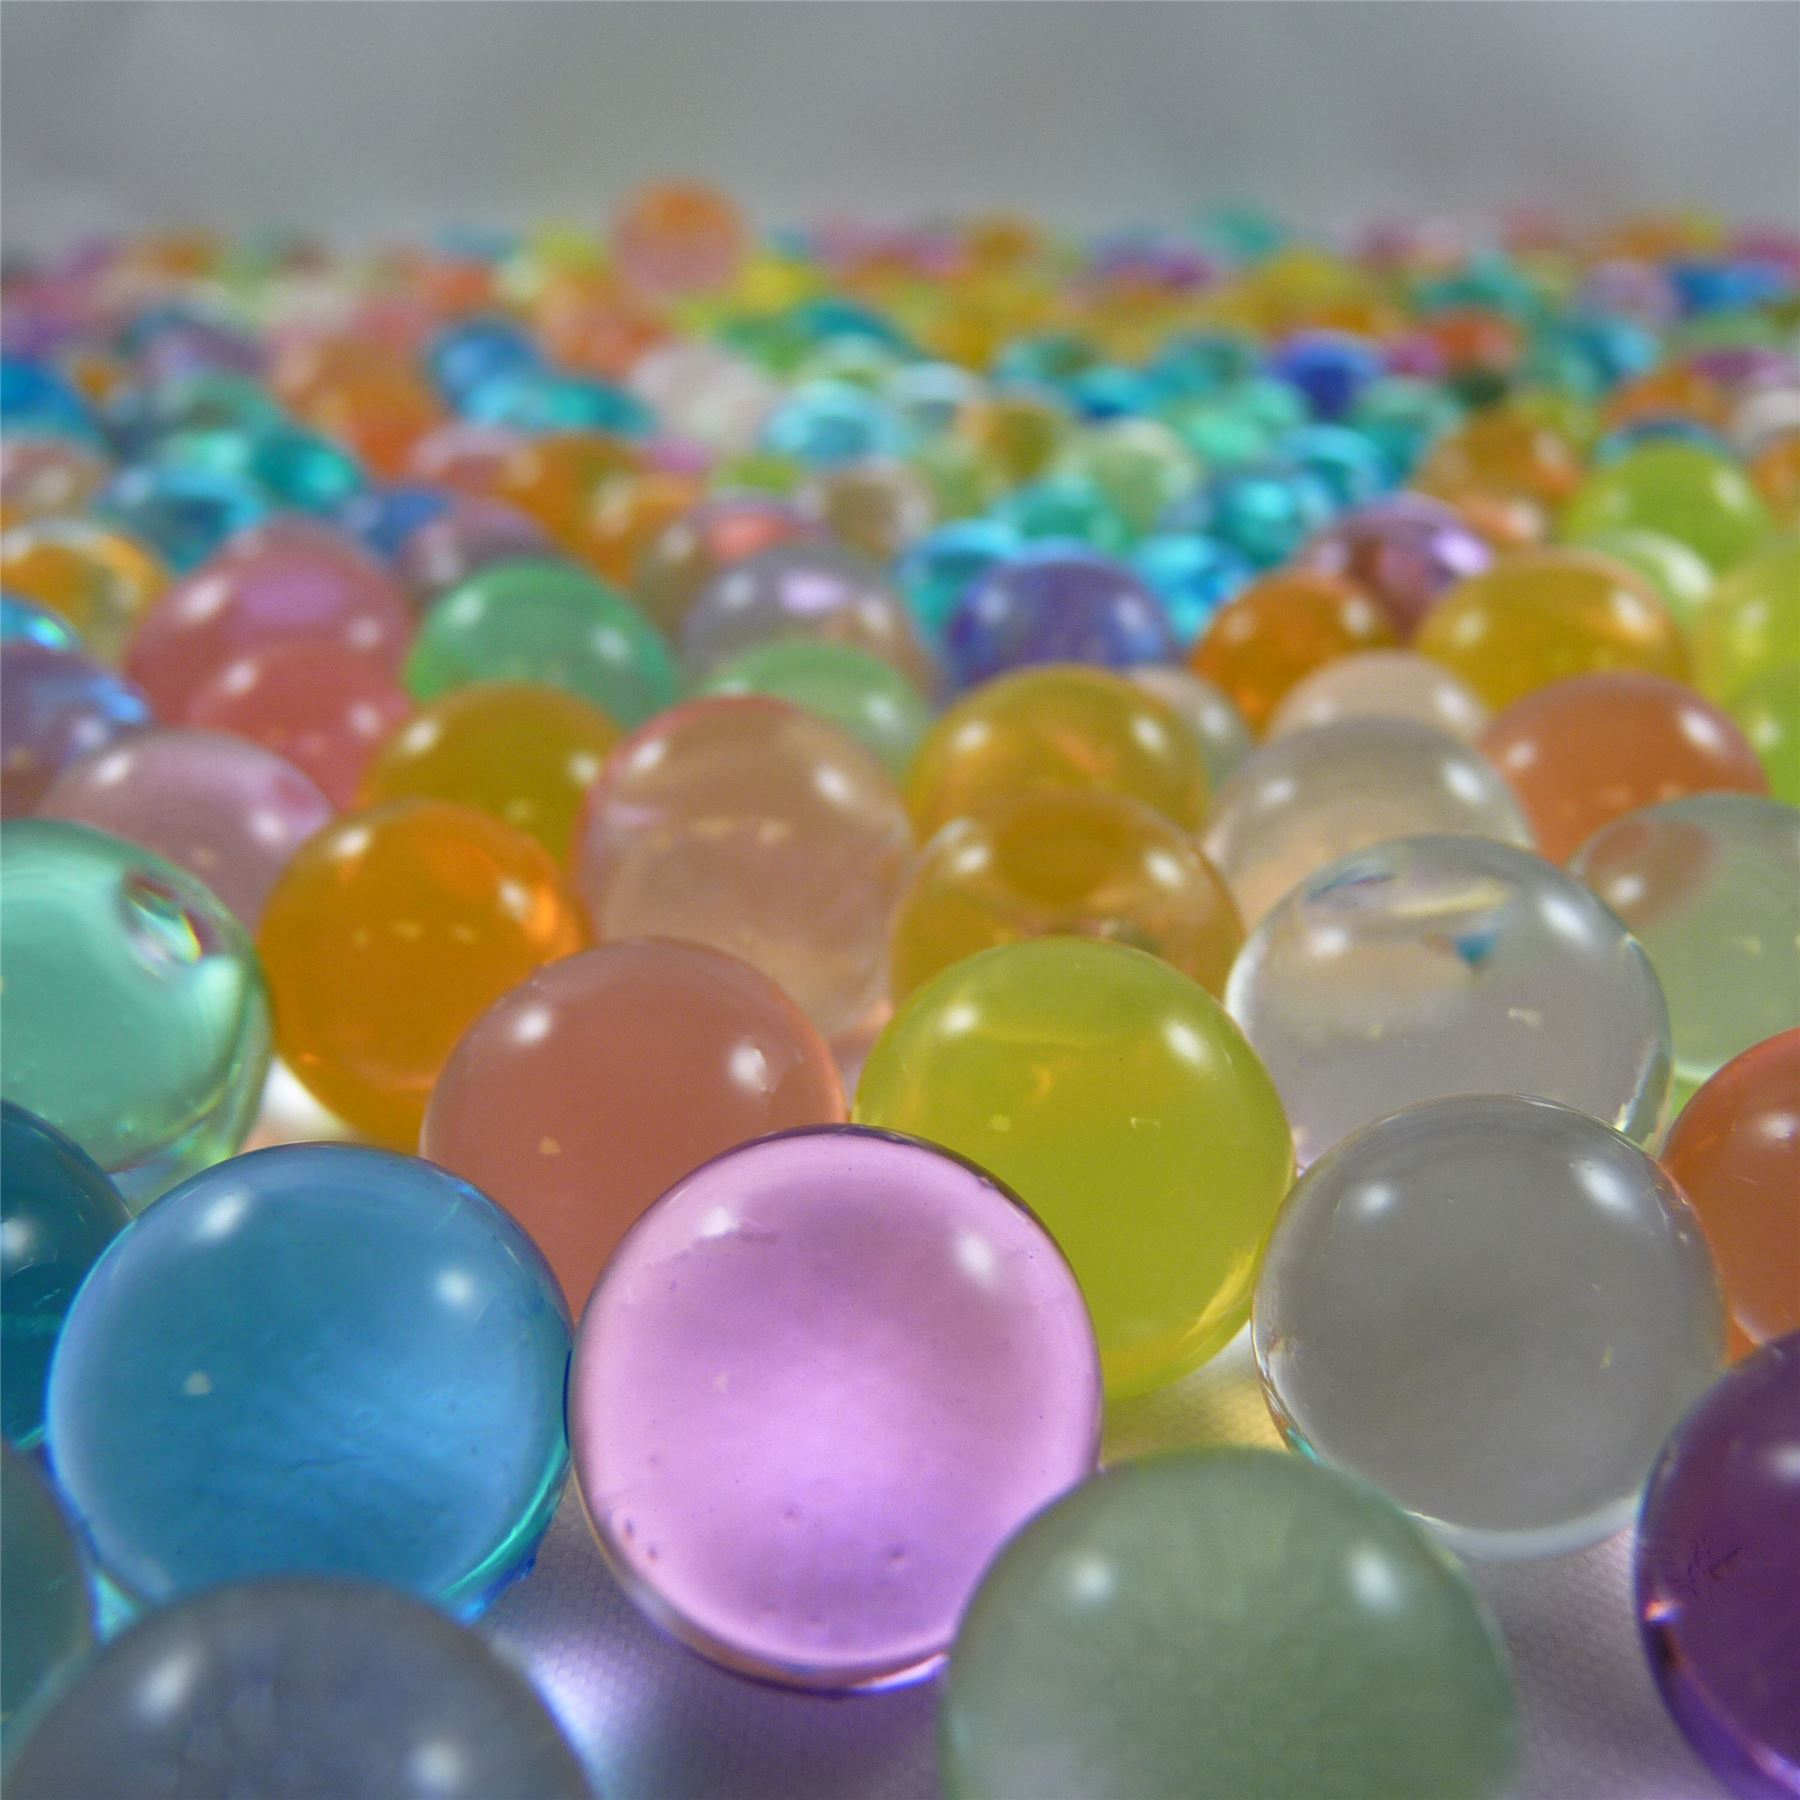 Aqua Crystal 174 Expanding Water Beads Bio Gel Ball Florist Centrepiece Vase Filler Ebay